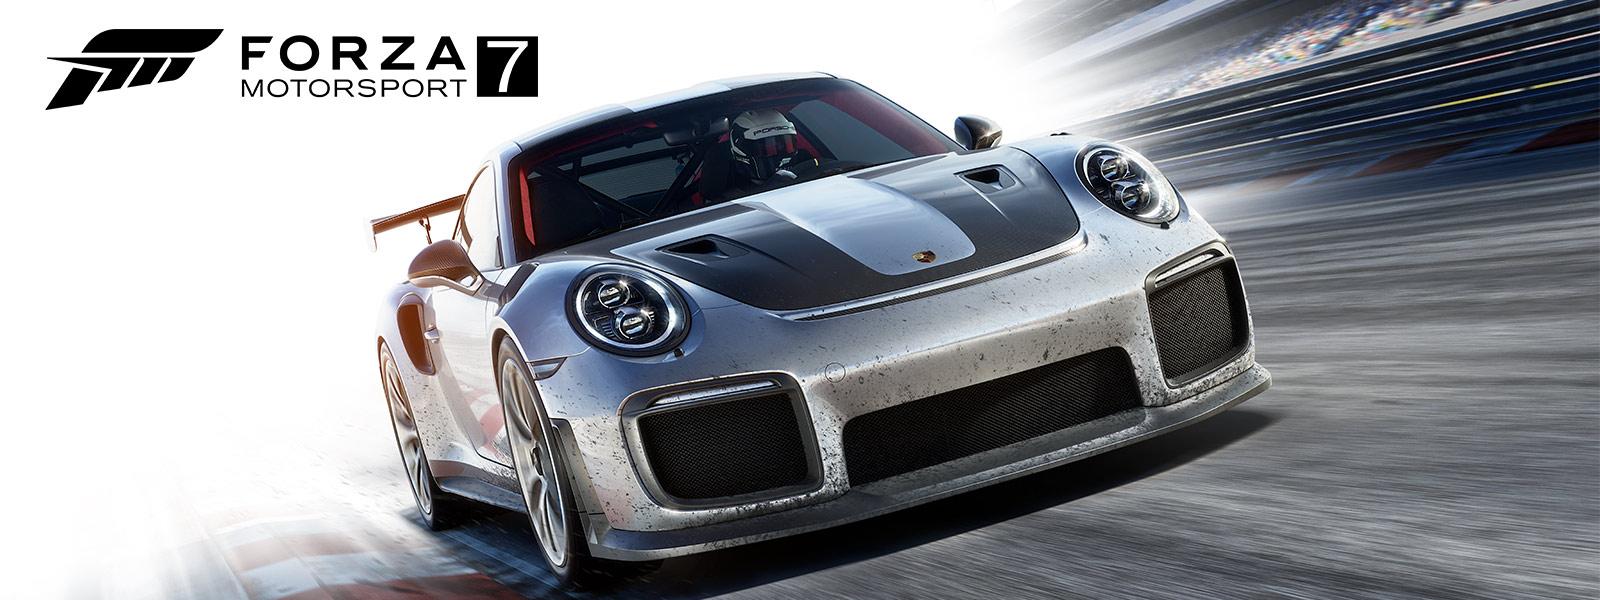 Schermopname Forza Motorsport 7